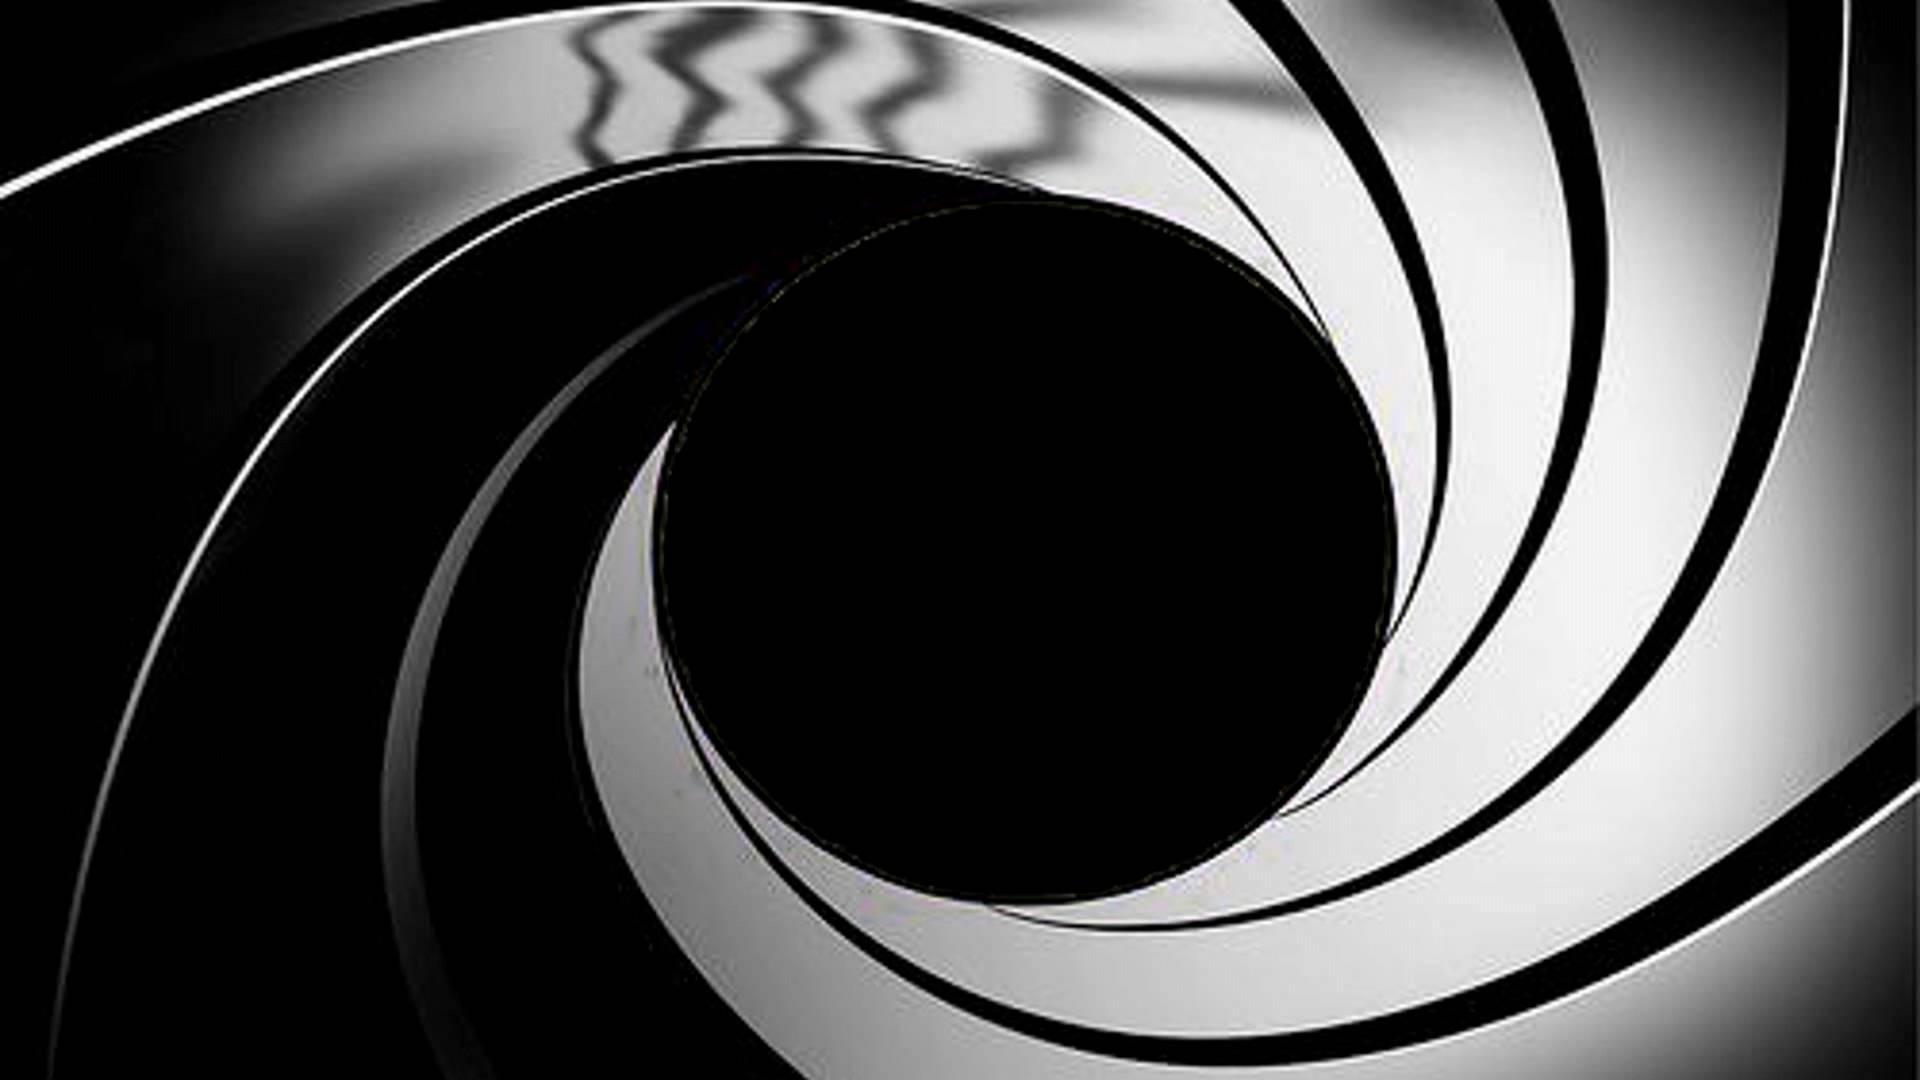 007 background hd